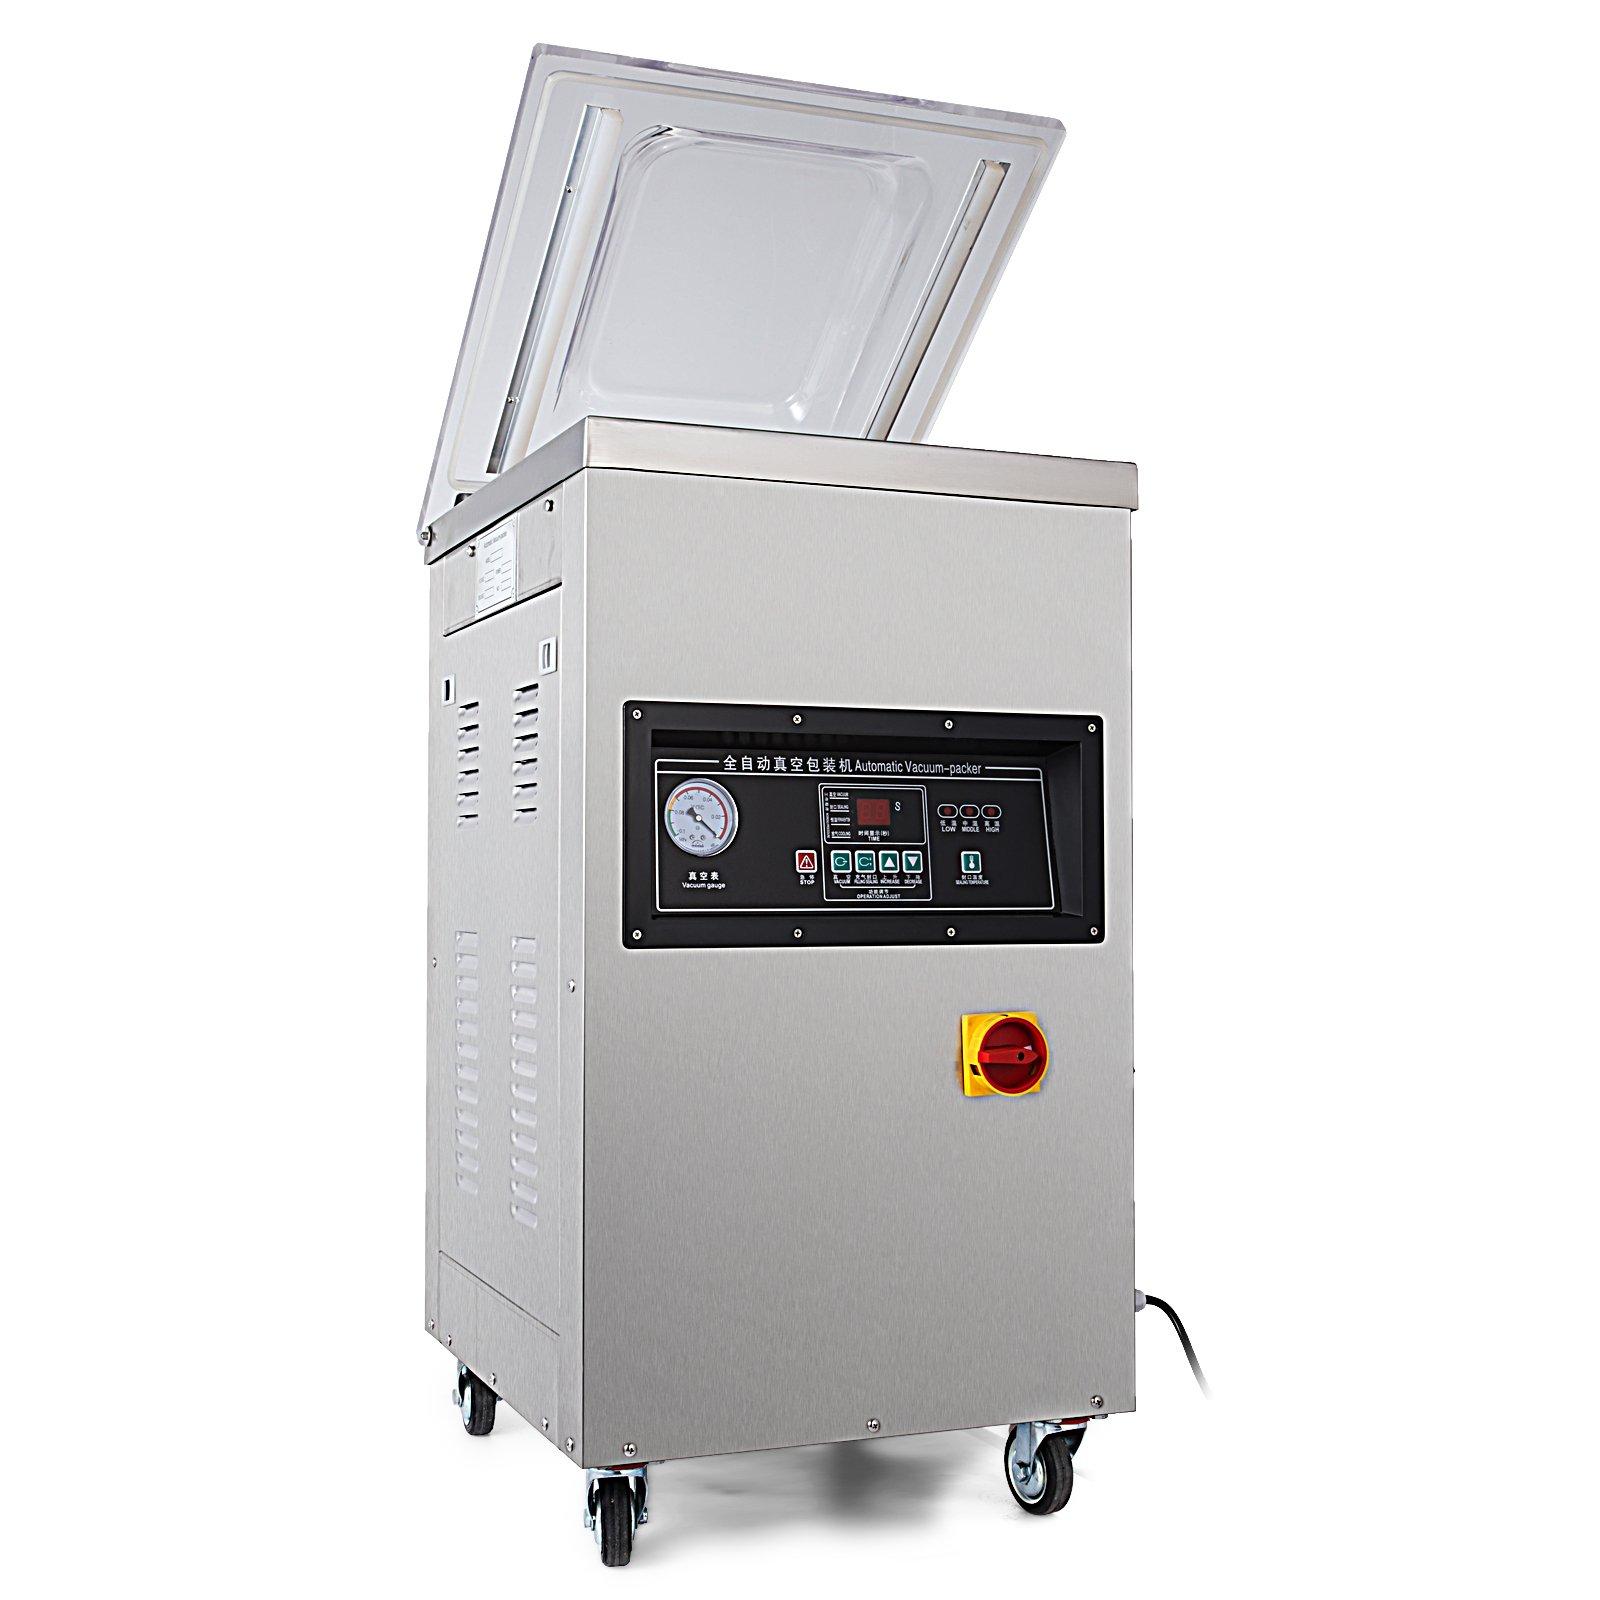 Happybuy DZ-400/2E Chamber Vacuum Sealer 1000W Vacuum Sealer Machine Automatic Vacuum Packing Sealing Sealer Machine for Home or Commercial Use (DZ-400/2E) by Happybuy (Image #1)